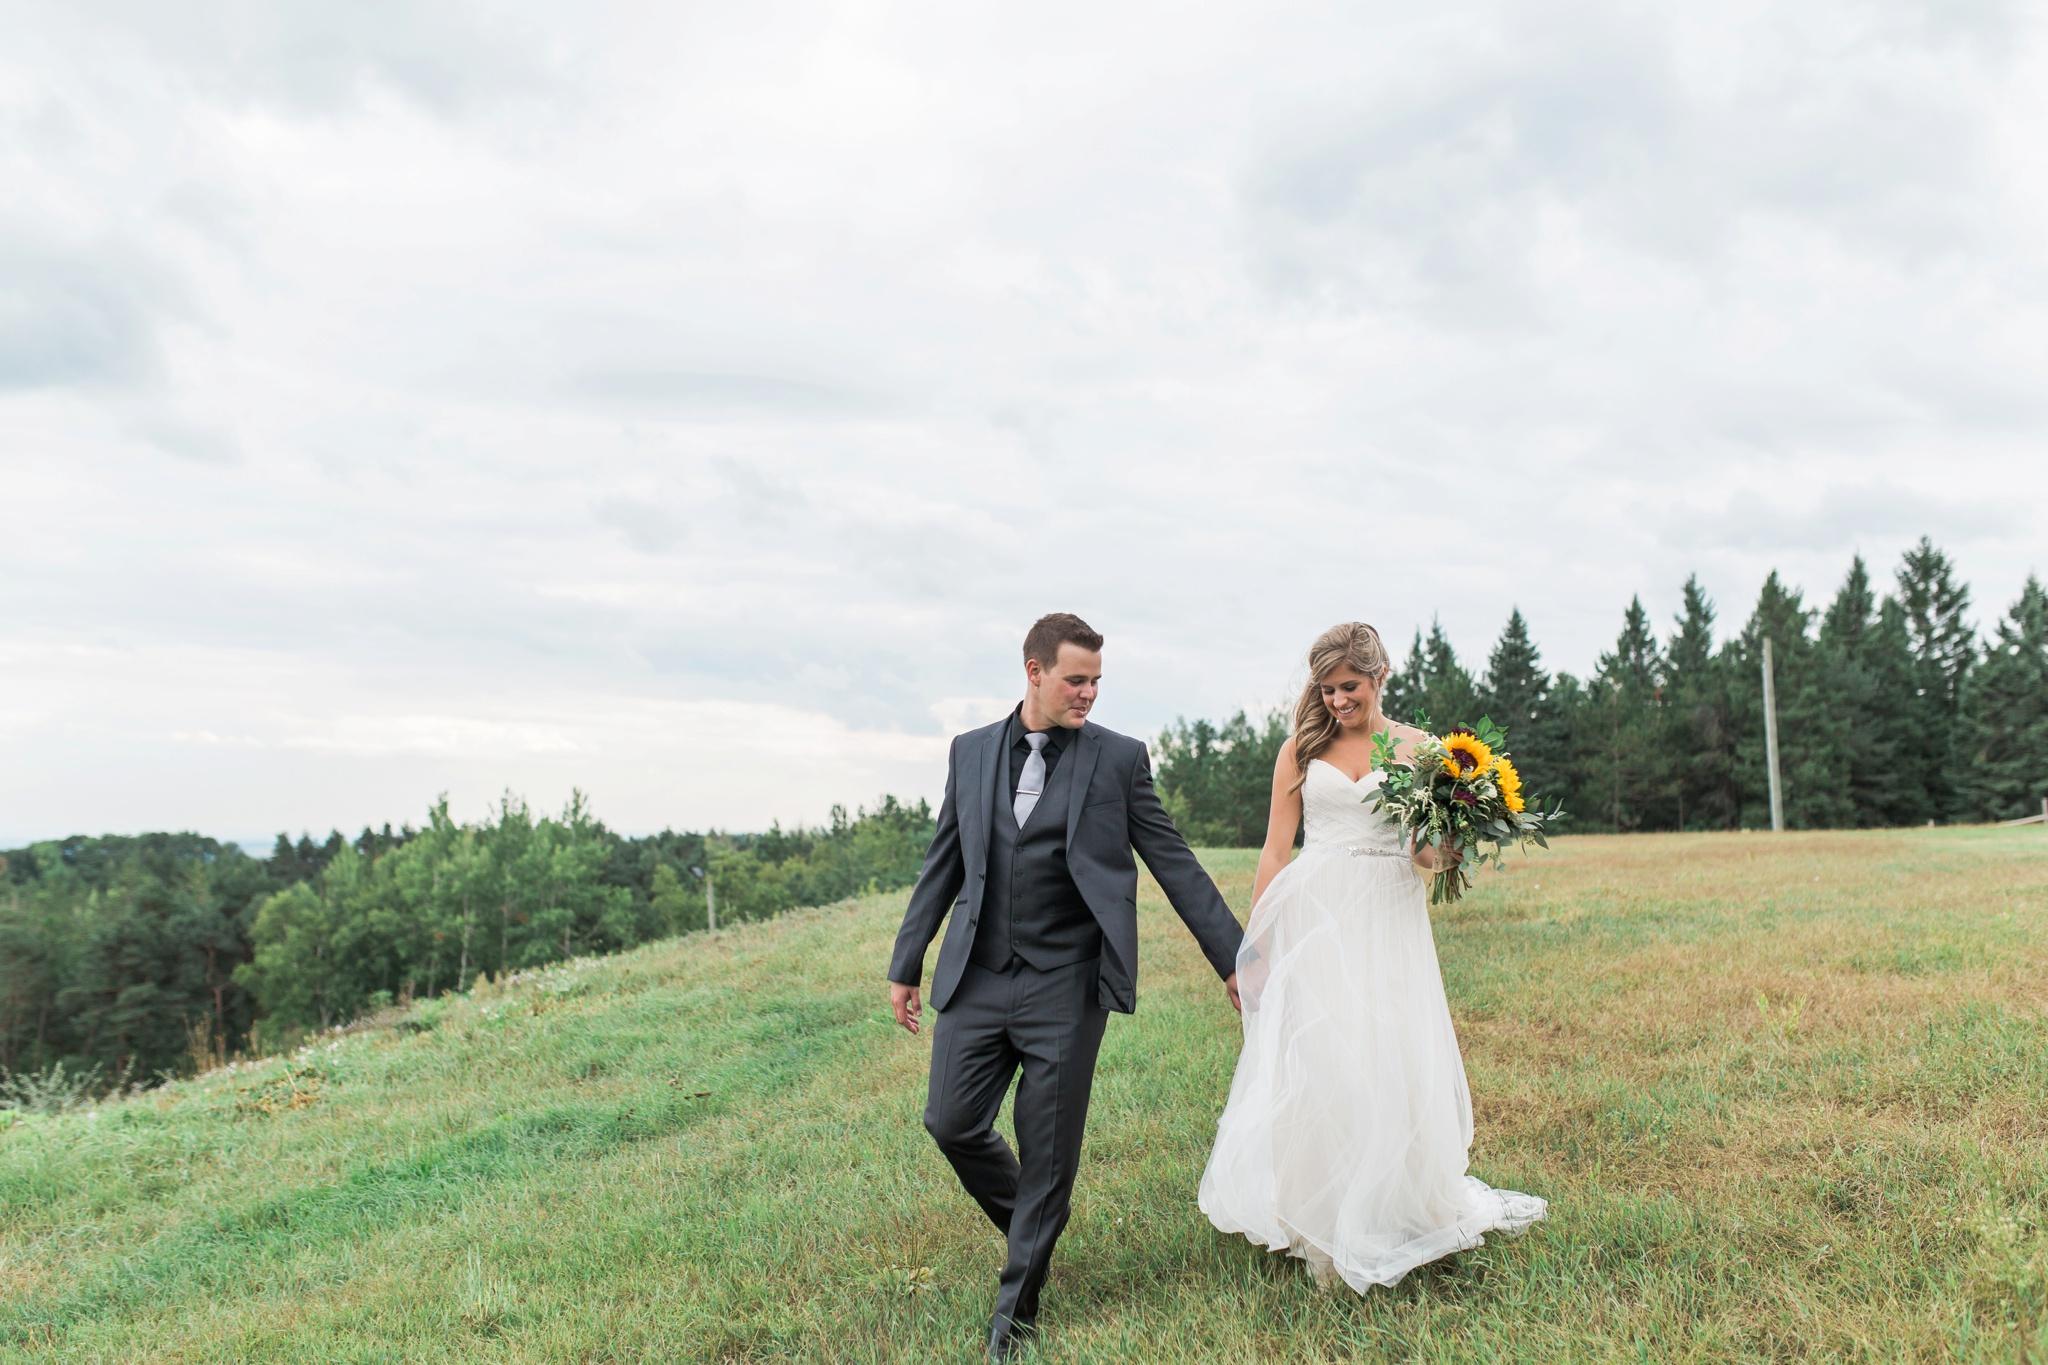 Outdoor Wedding, Fine Art Photography